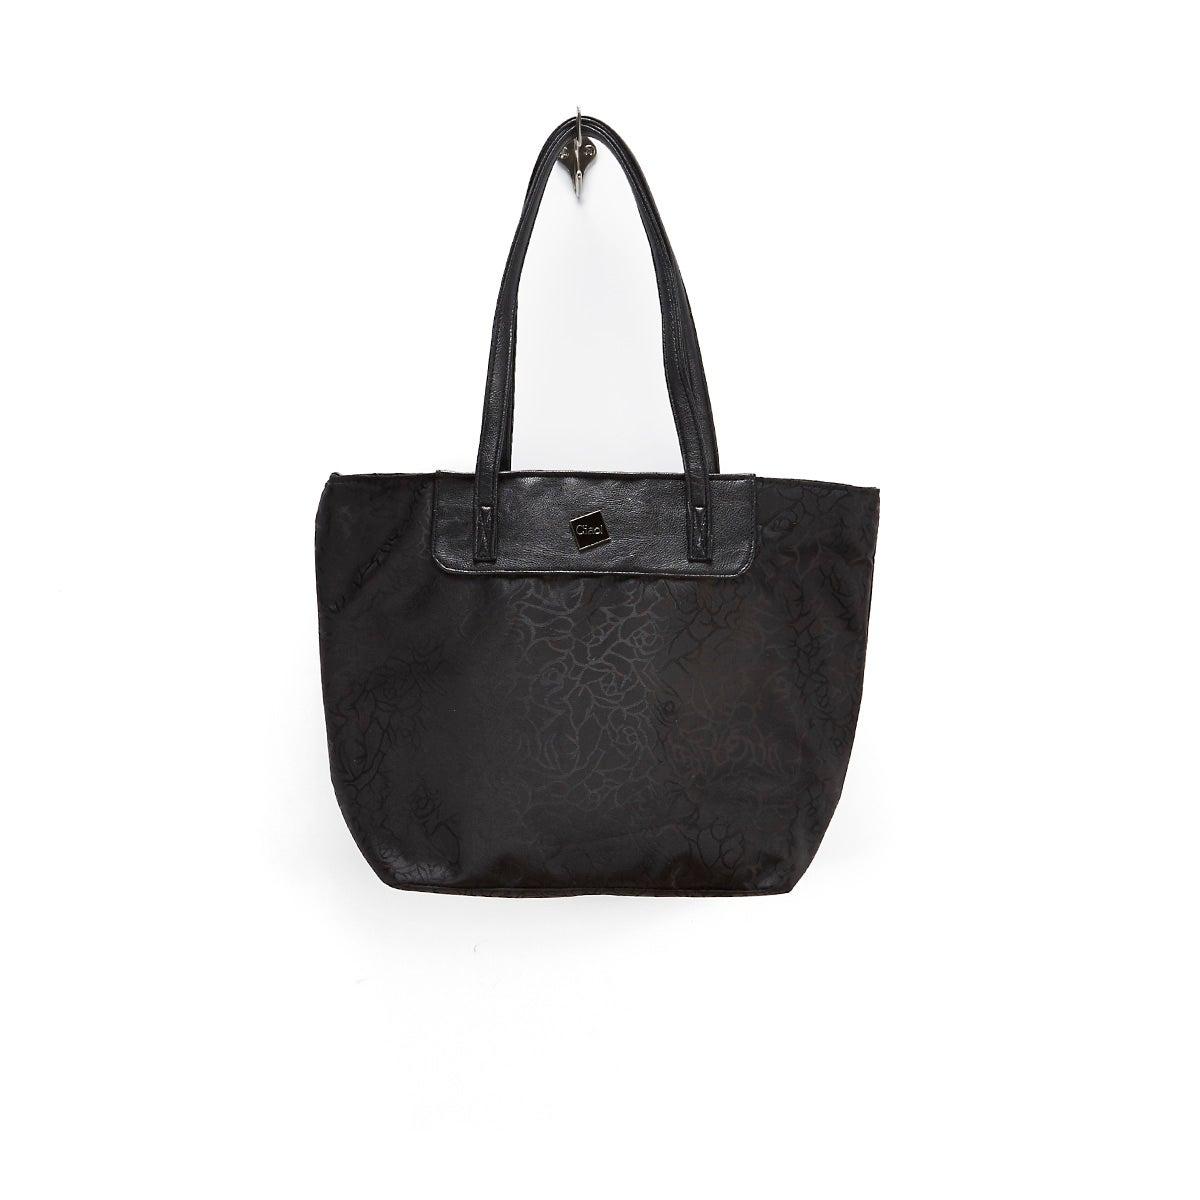 Lds Edith black printed cooler bag